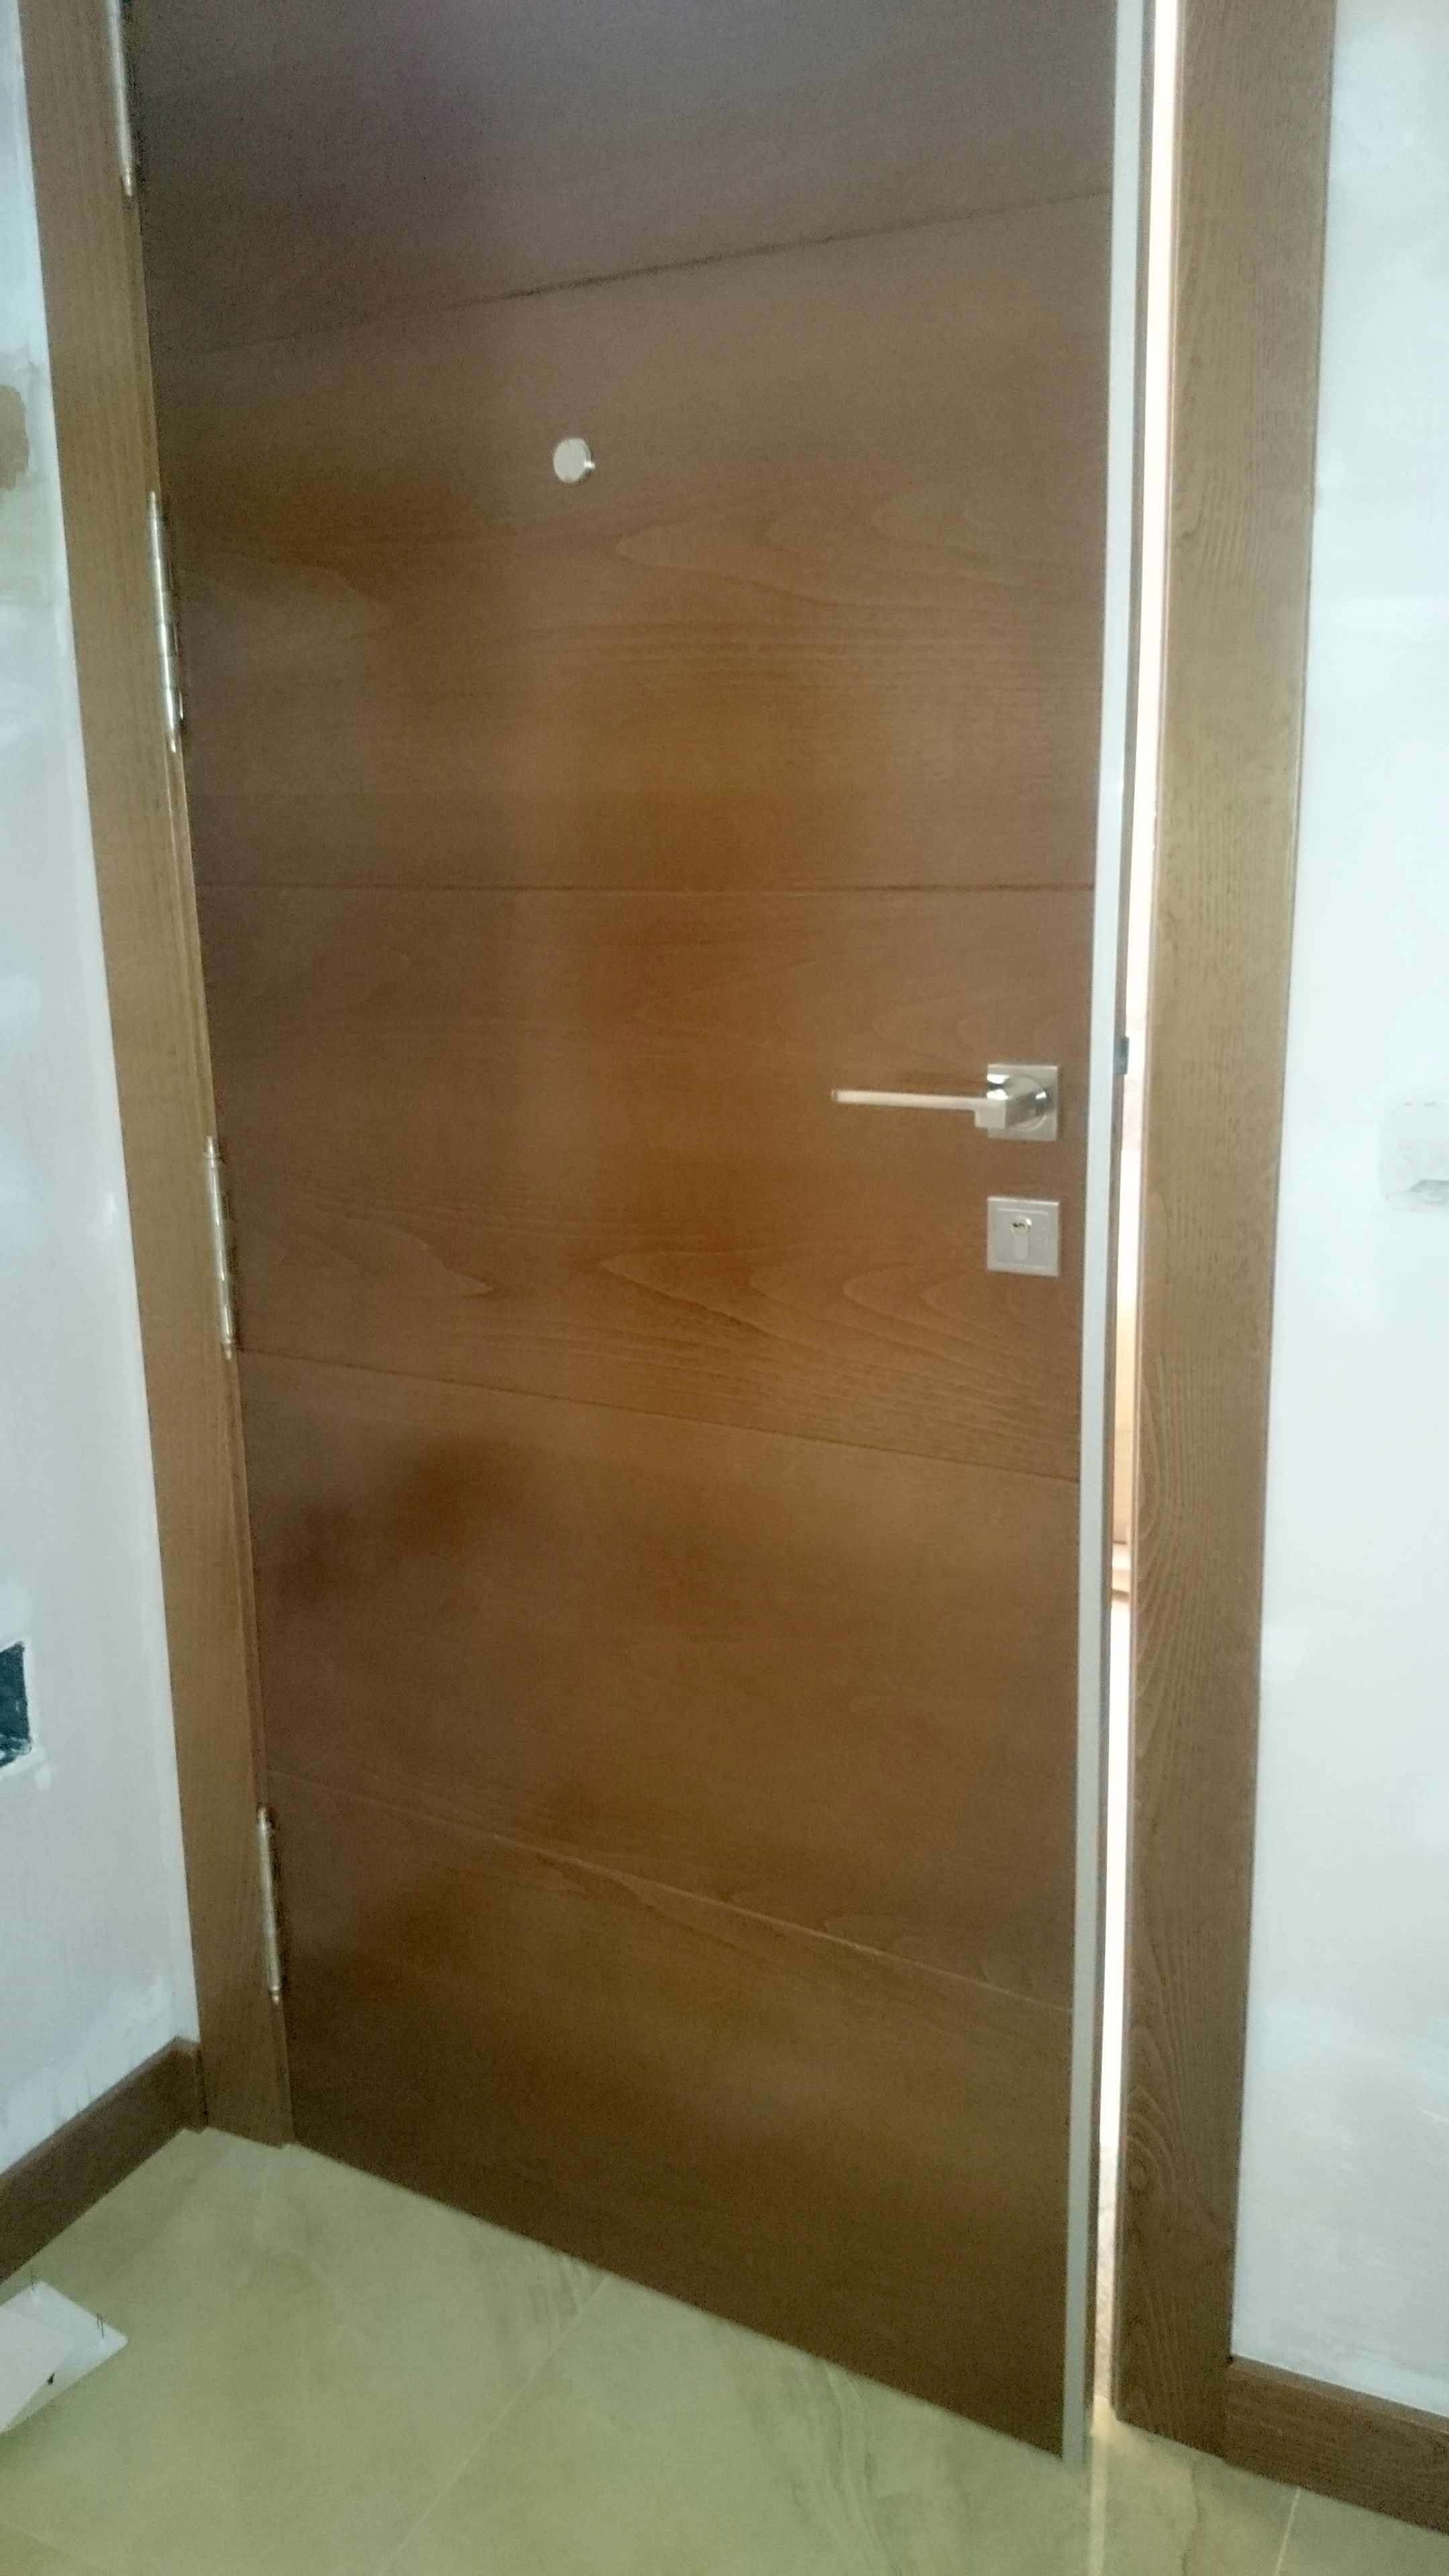 Carpinter a familia murcia vivienda completa - Carpinteria de aluminio murcia ...